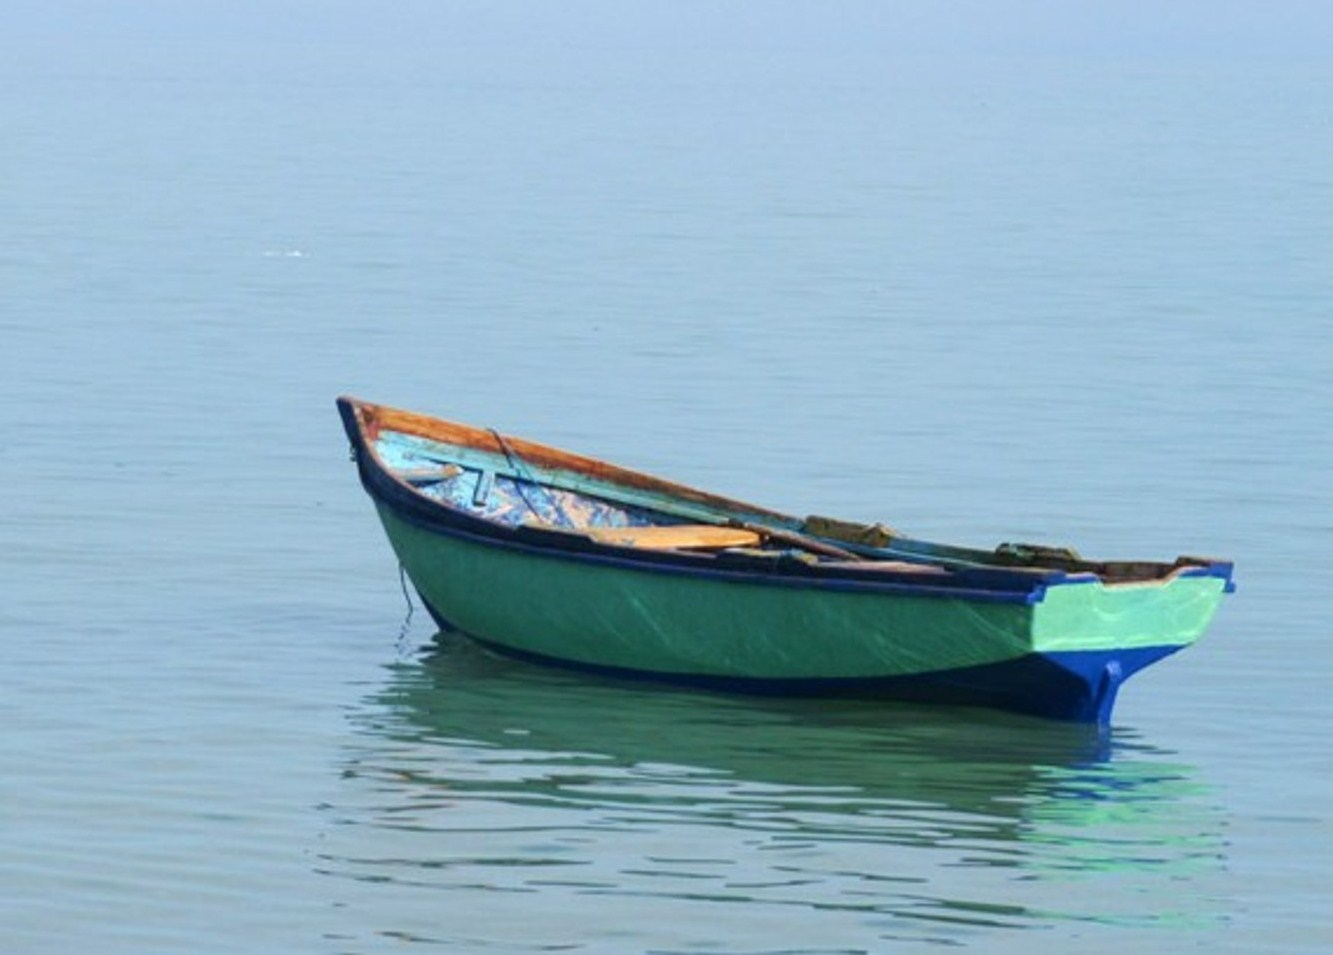 Yola (boat), Miches